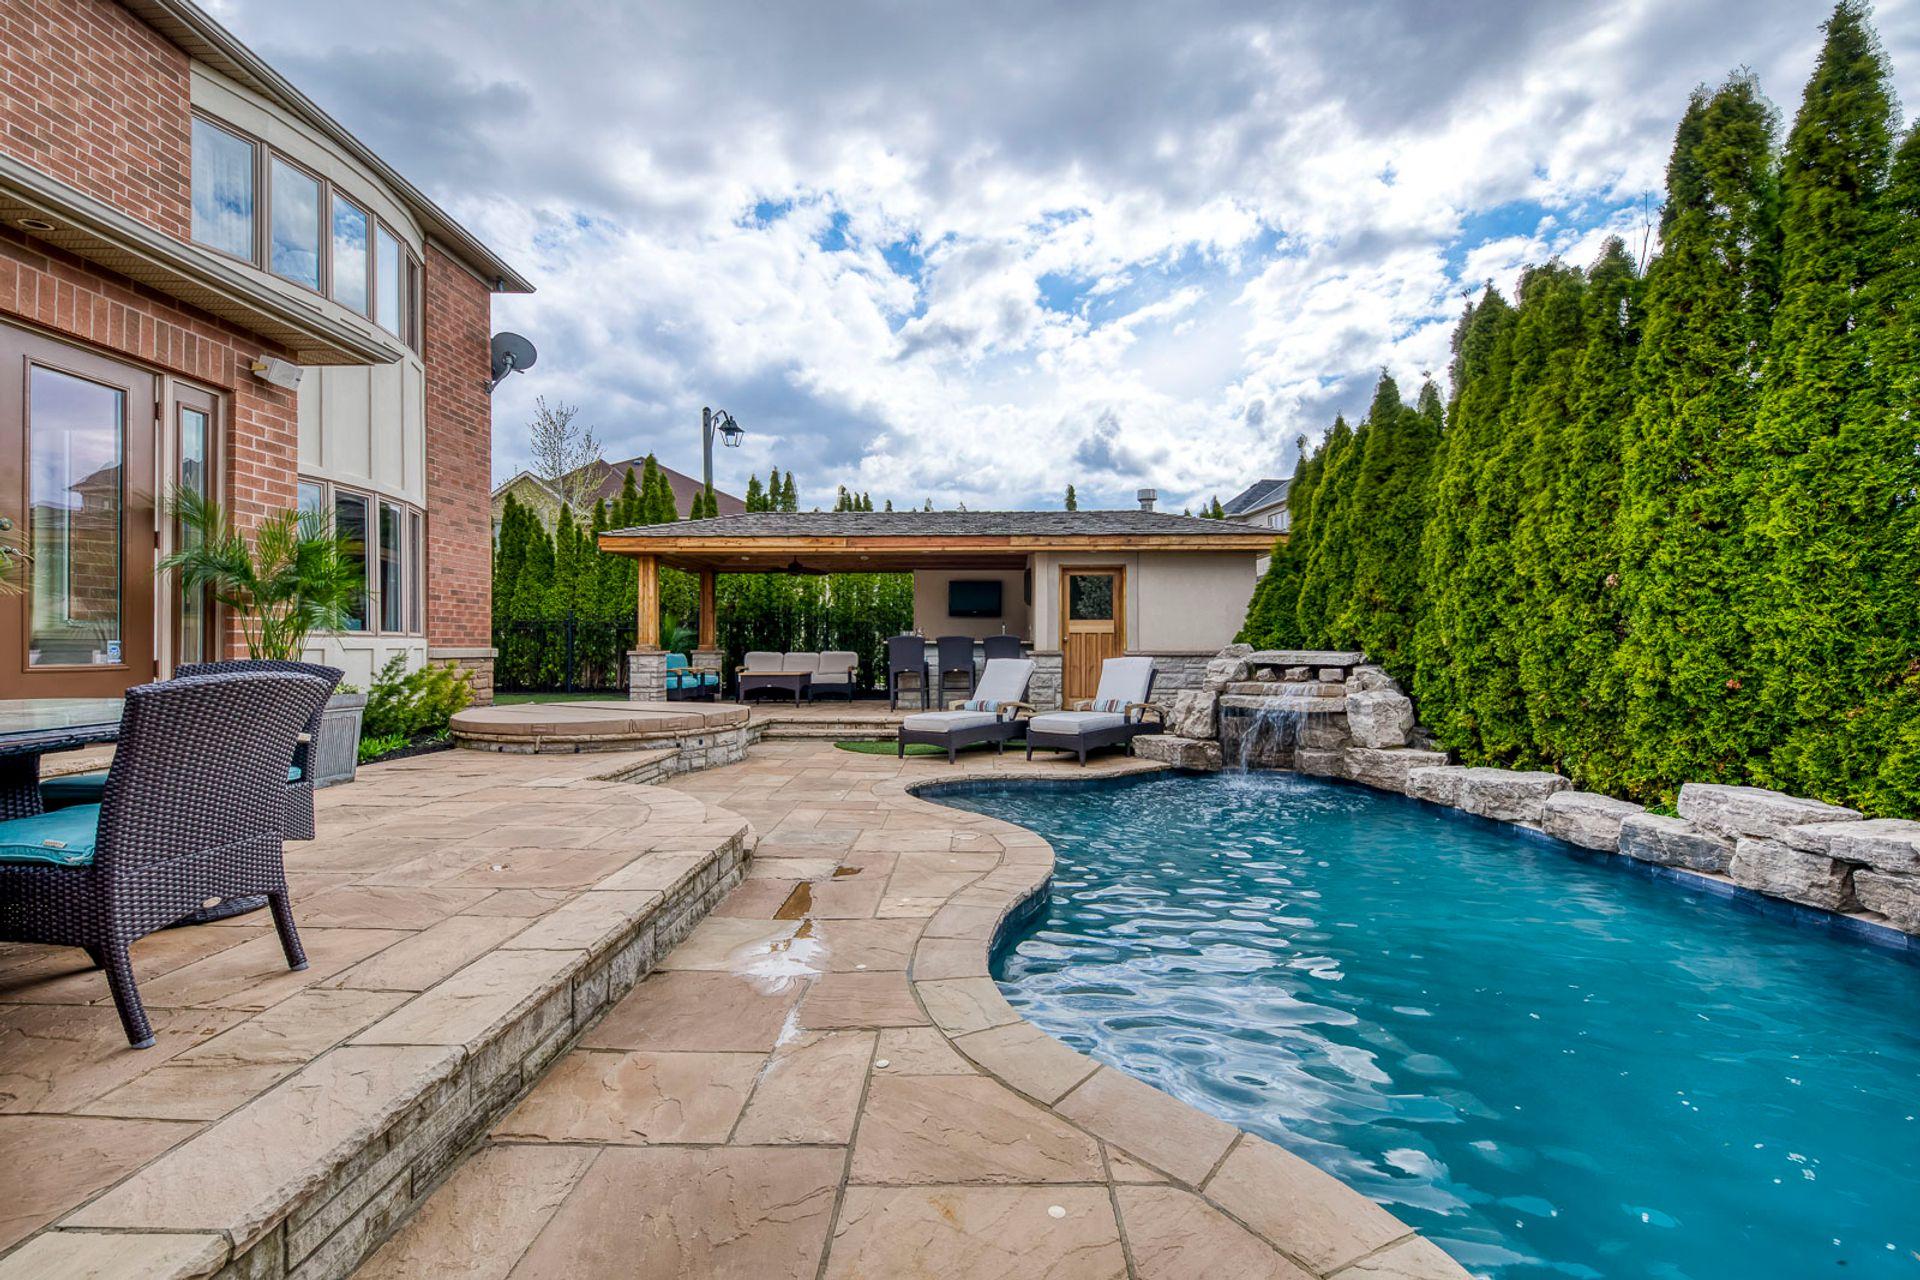 Swimming Pool - 2487 Bon Echo Dr, Oakville - Elite3 & Team at 2487 Bon Echo Drive, Iroquois Ridge North, Oakville